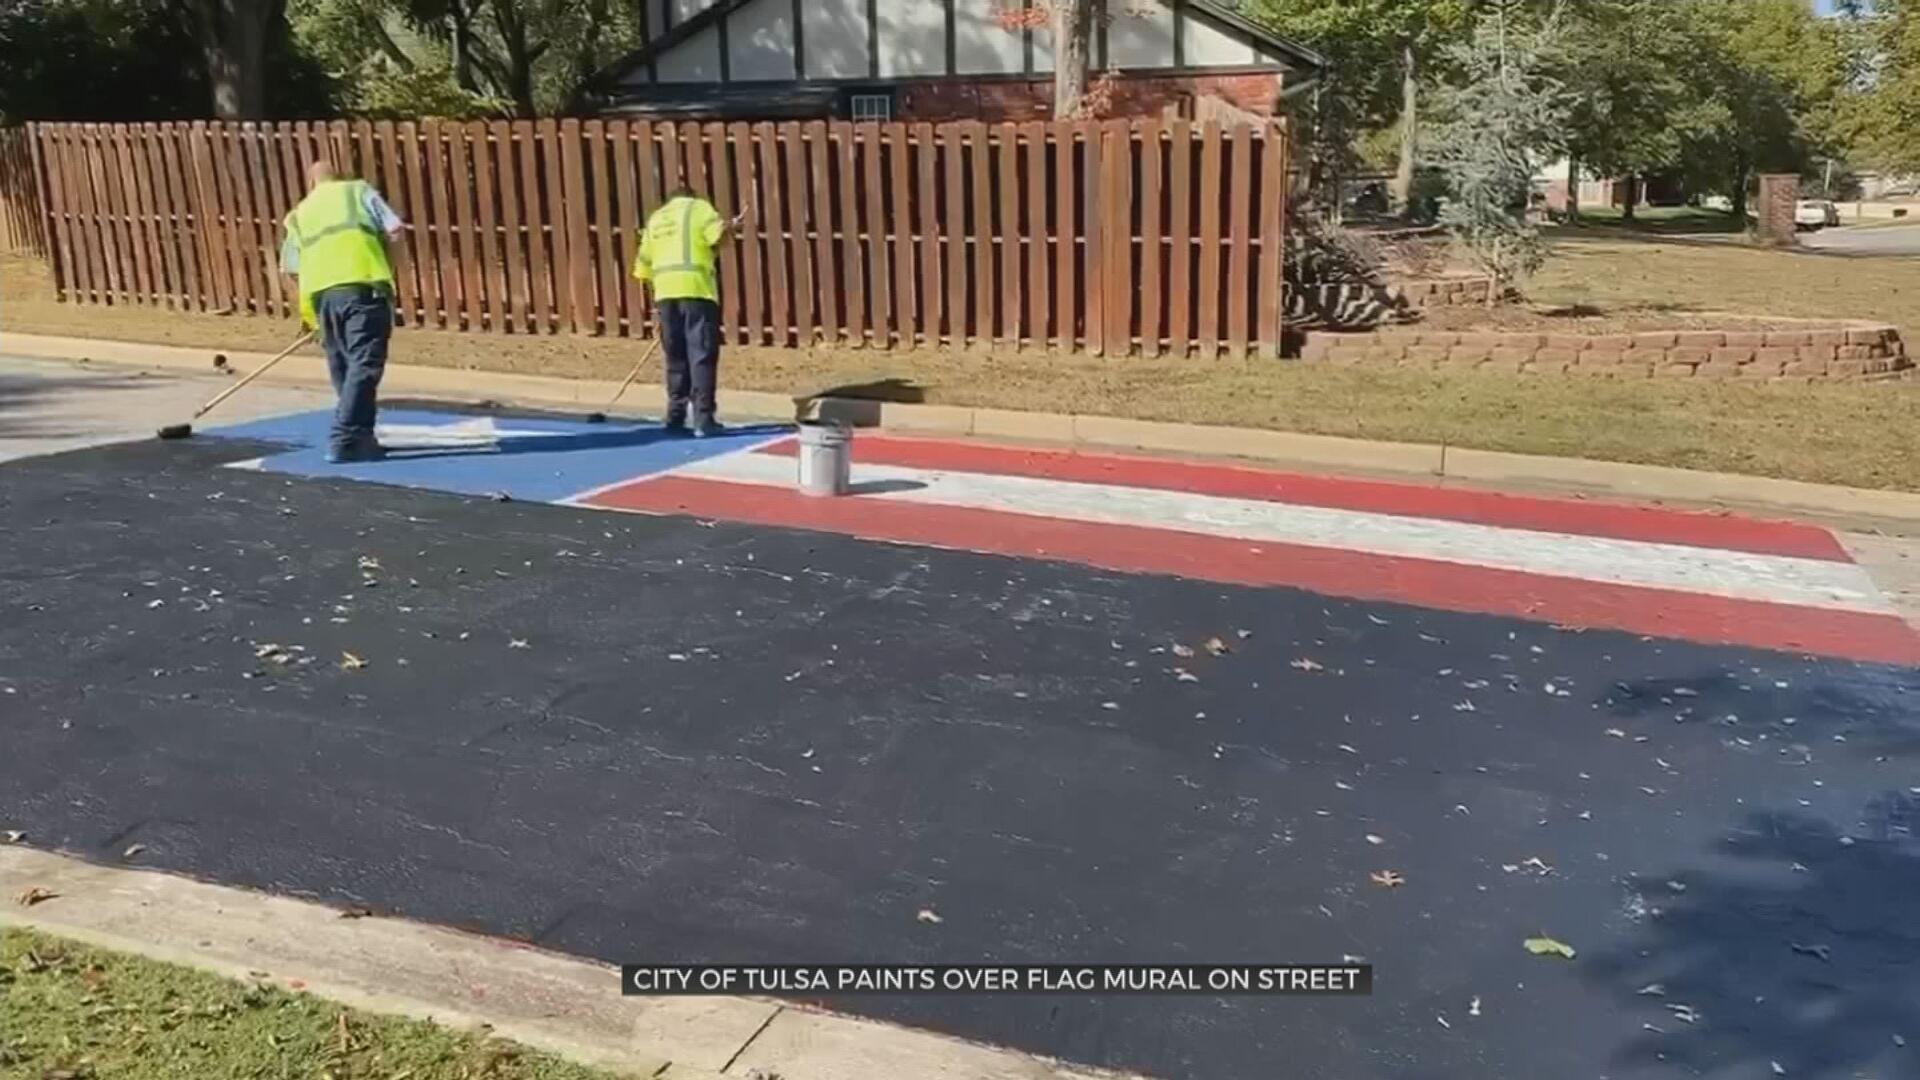 City Road Crews Paint Over Street Mural Honoring Marine